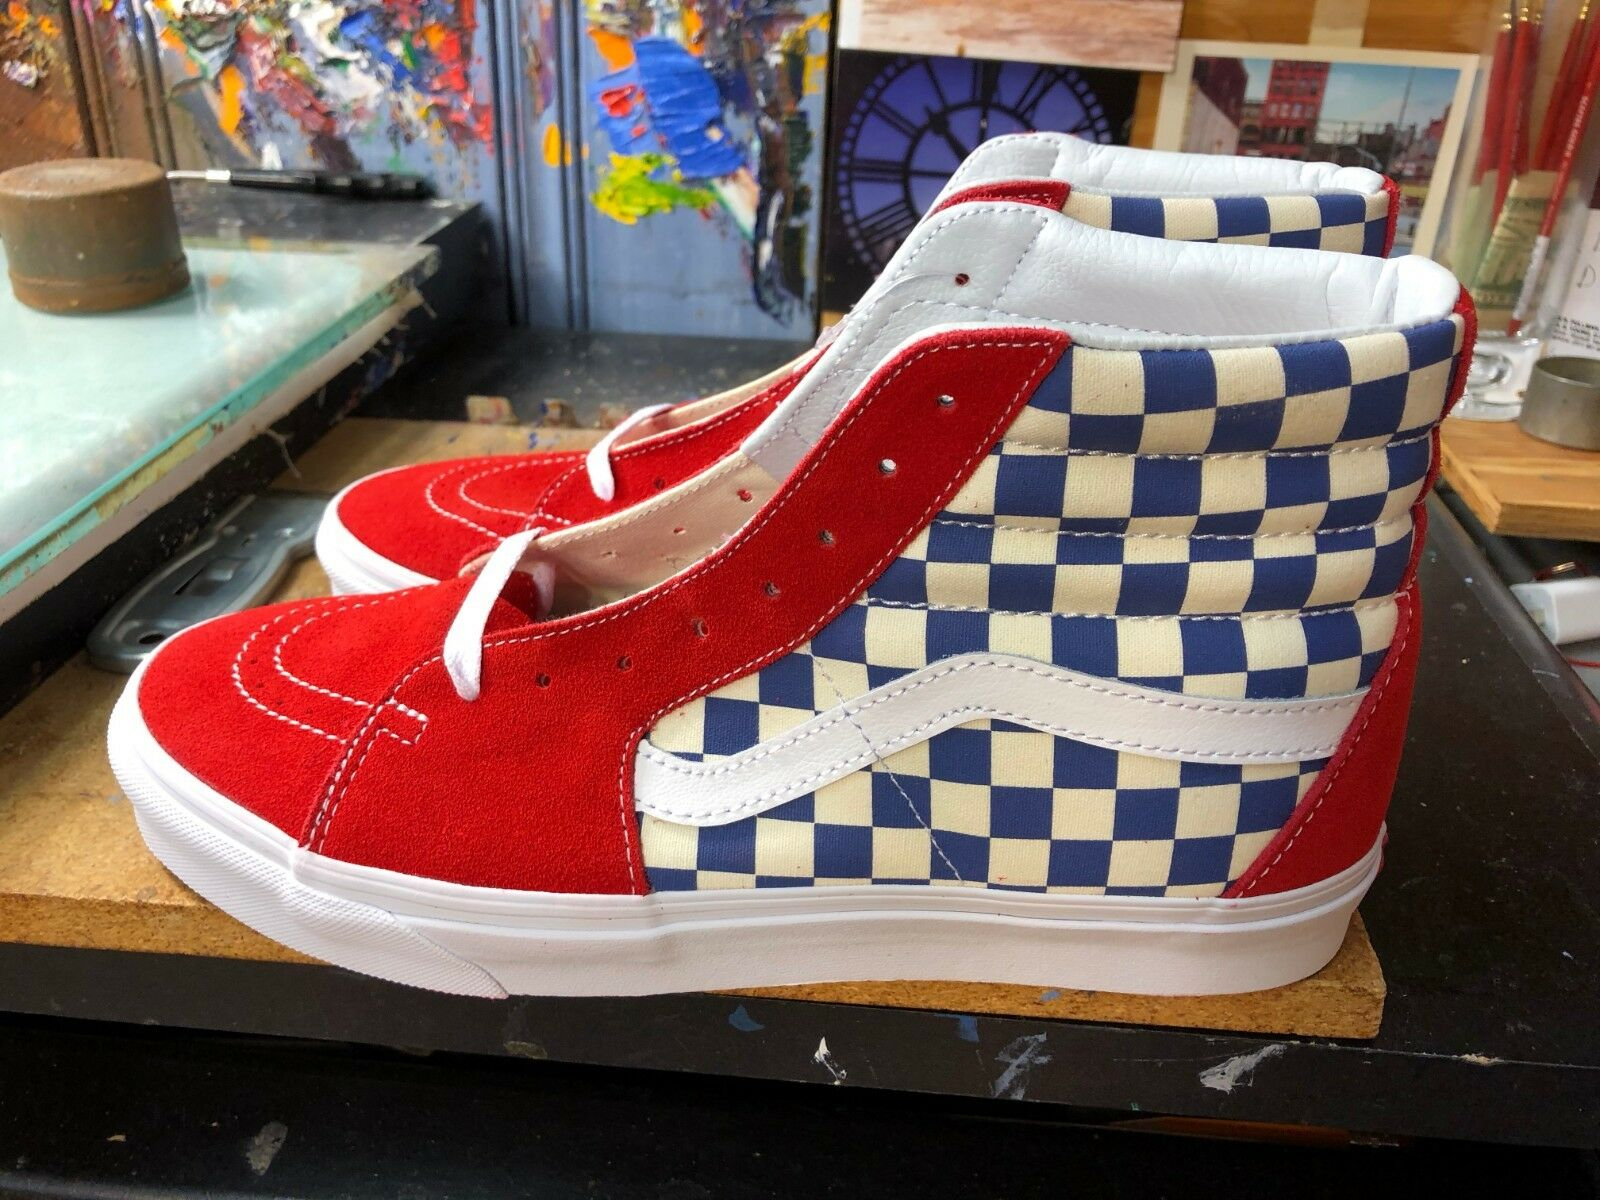 Vans SK8-Hi (BMX Checkerboard) True bluee Red Suede Size US 11.5 Men VN0A38GEU8H